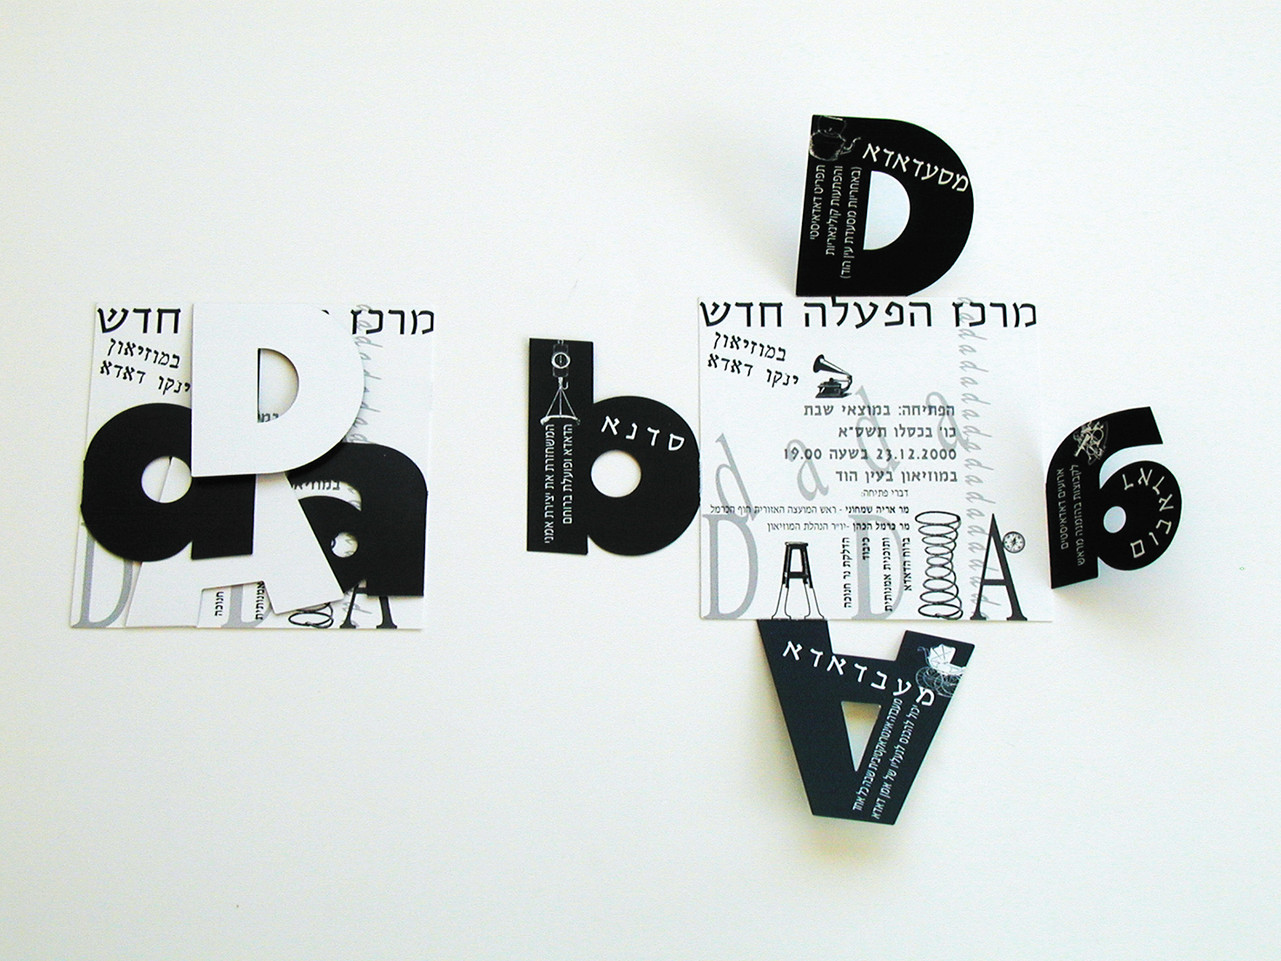 Exhibition Invitation,The Dadalab, Janco-Dada Museum, Ein Hod, 2000